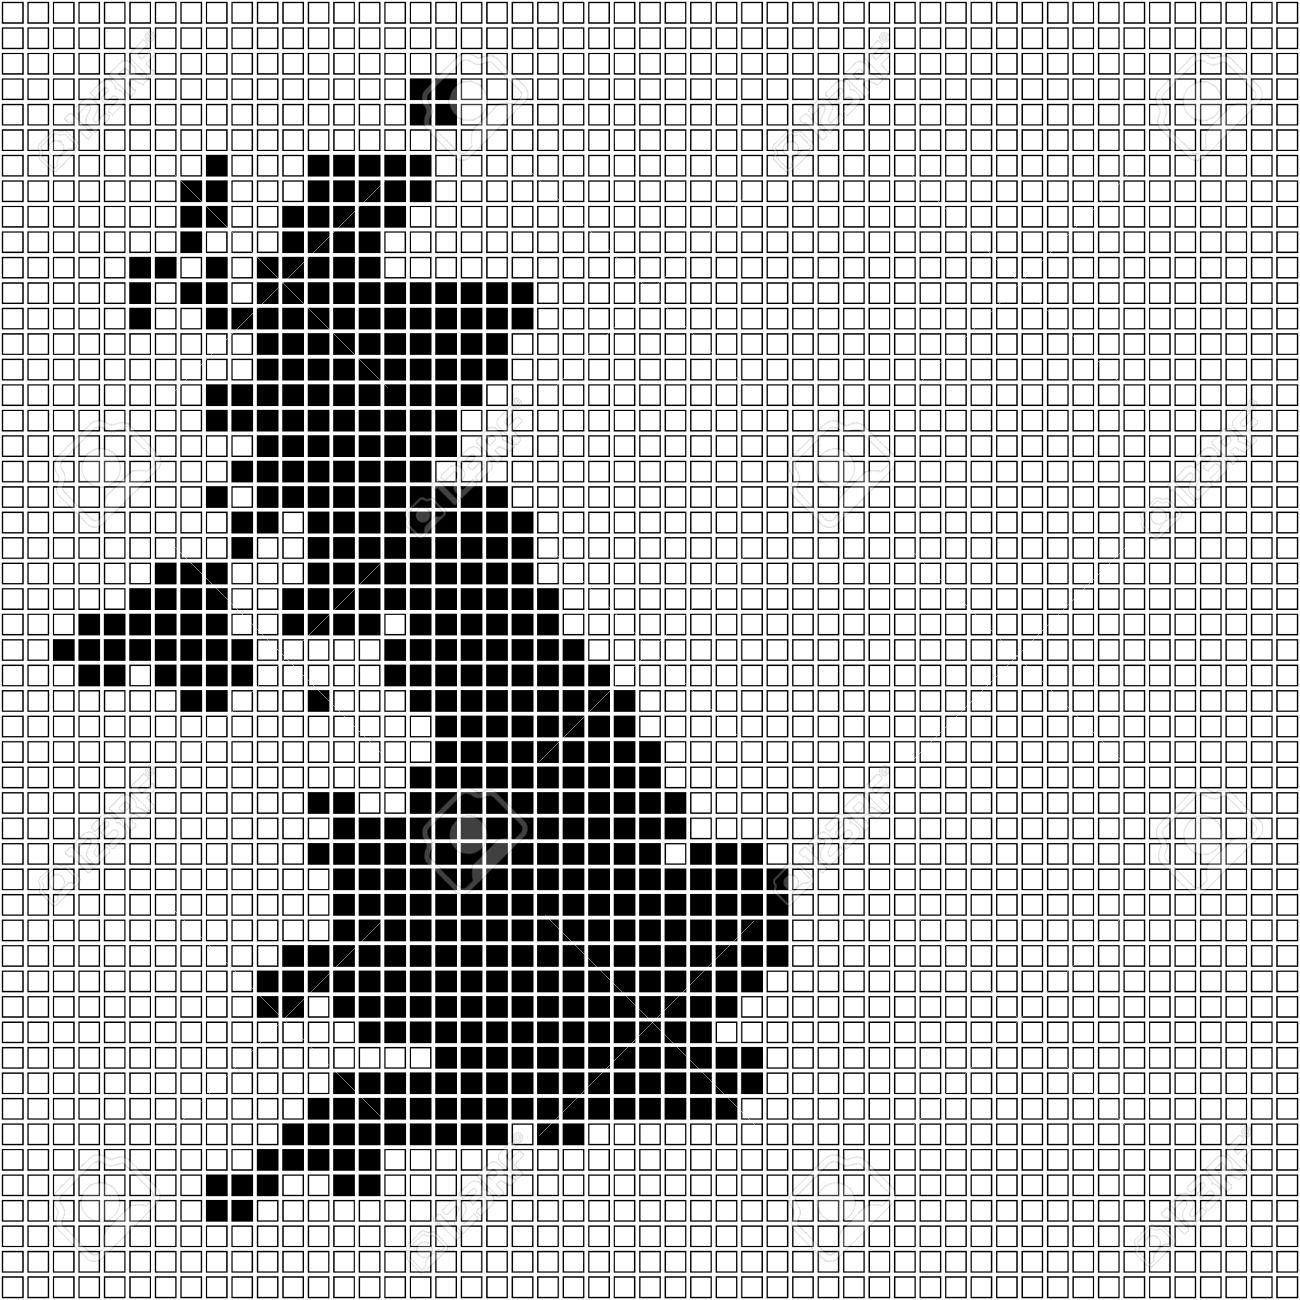 Pixel Art Of United Kingdom Black And White